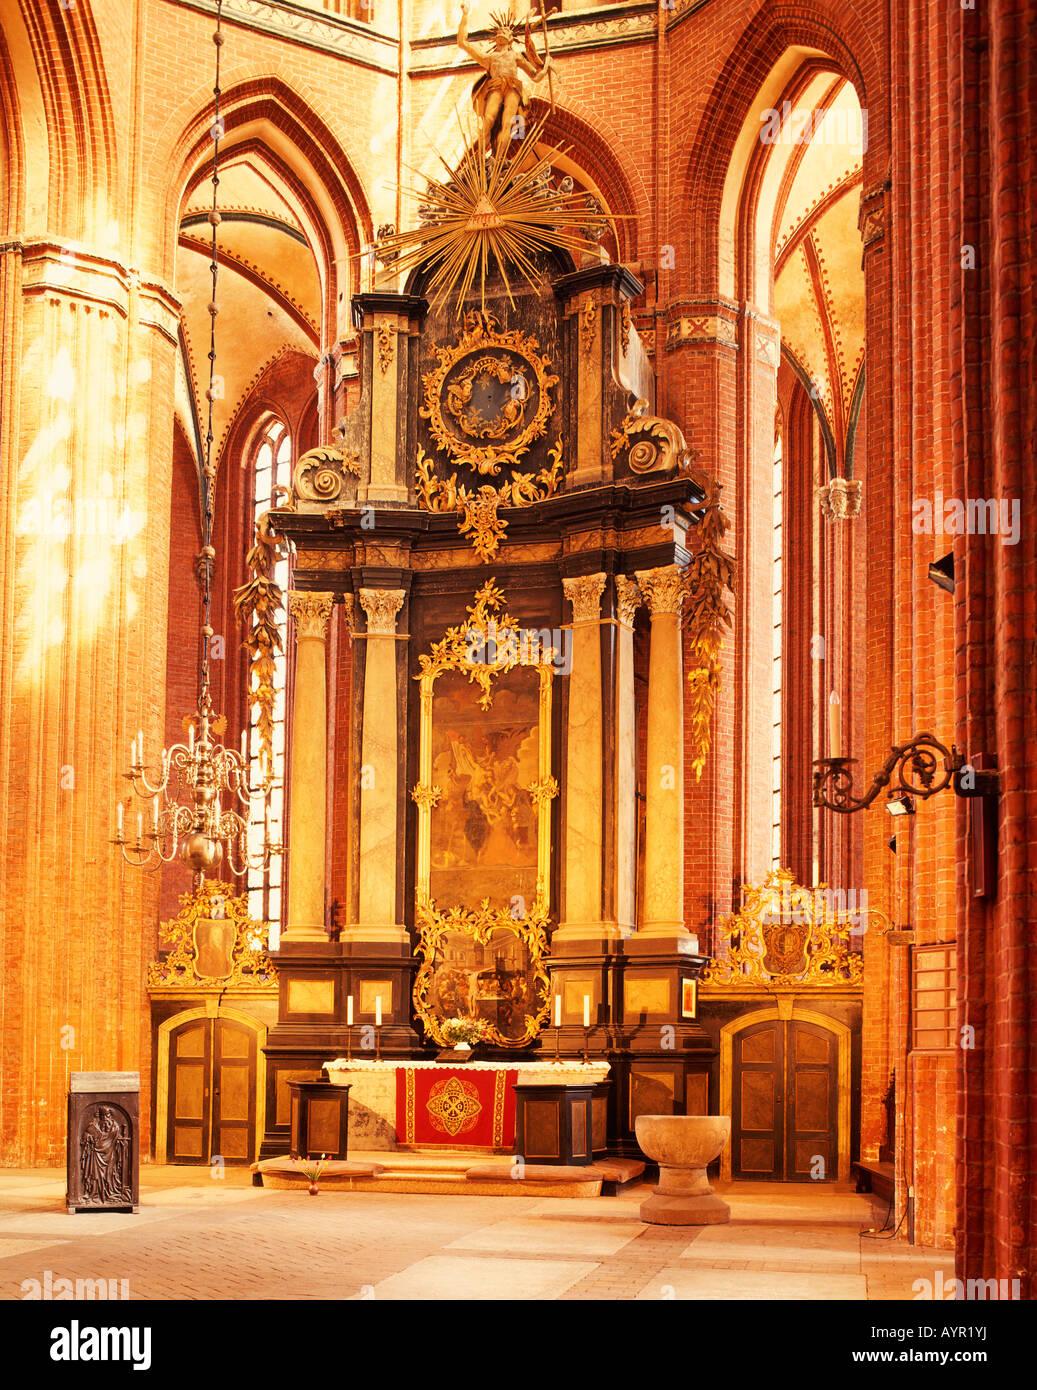 Nikolai Church, interior view, main altar, UNESCO World Heritage Site, Wismar, Mecklenburg-Western Pomerania, Germany - Stock Image